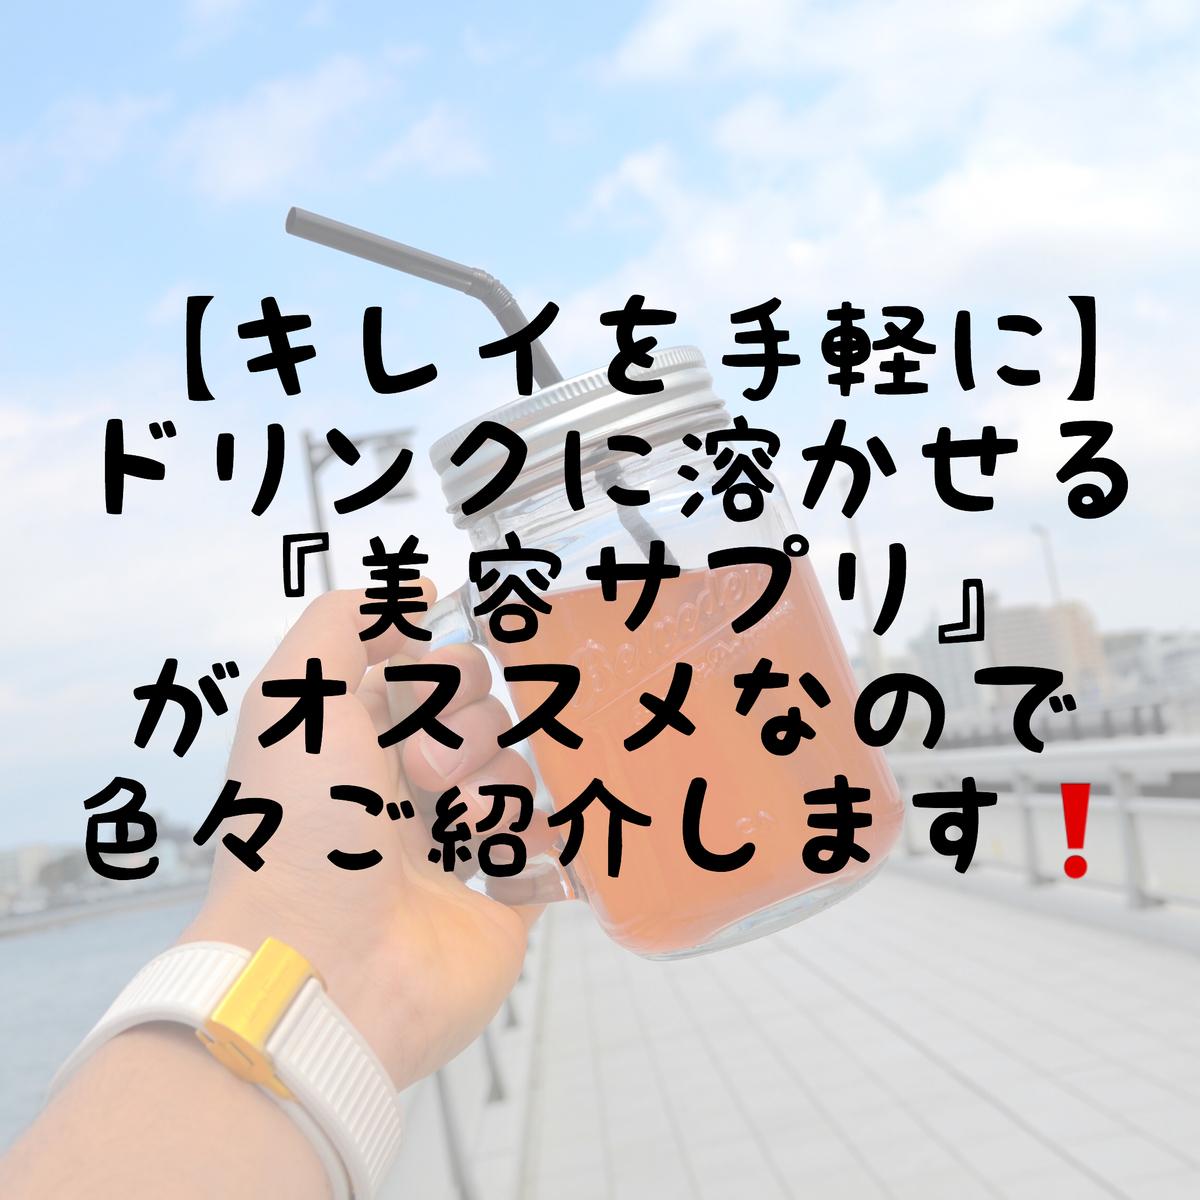 f:id:nokonoko_o:20200612130949j:plain